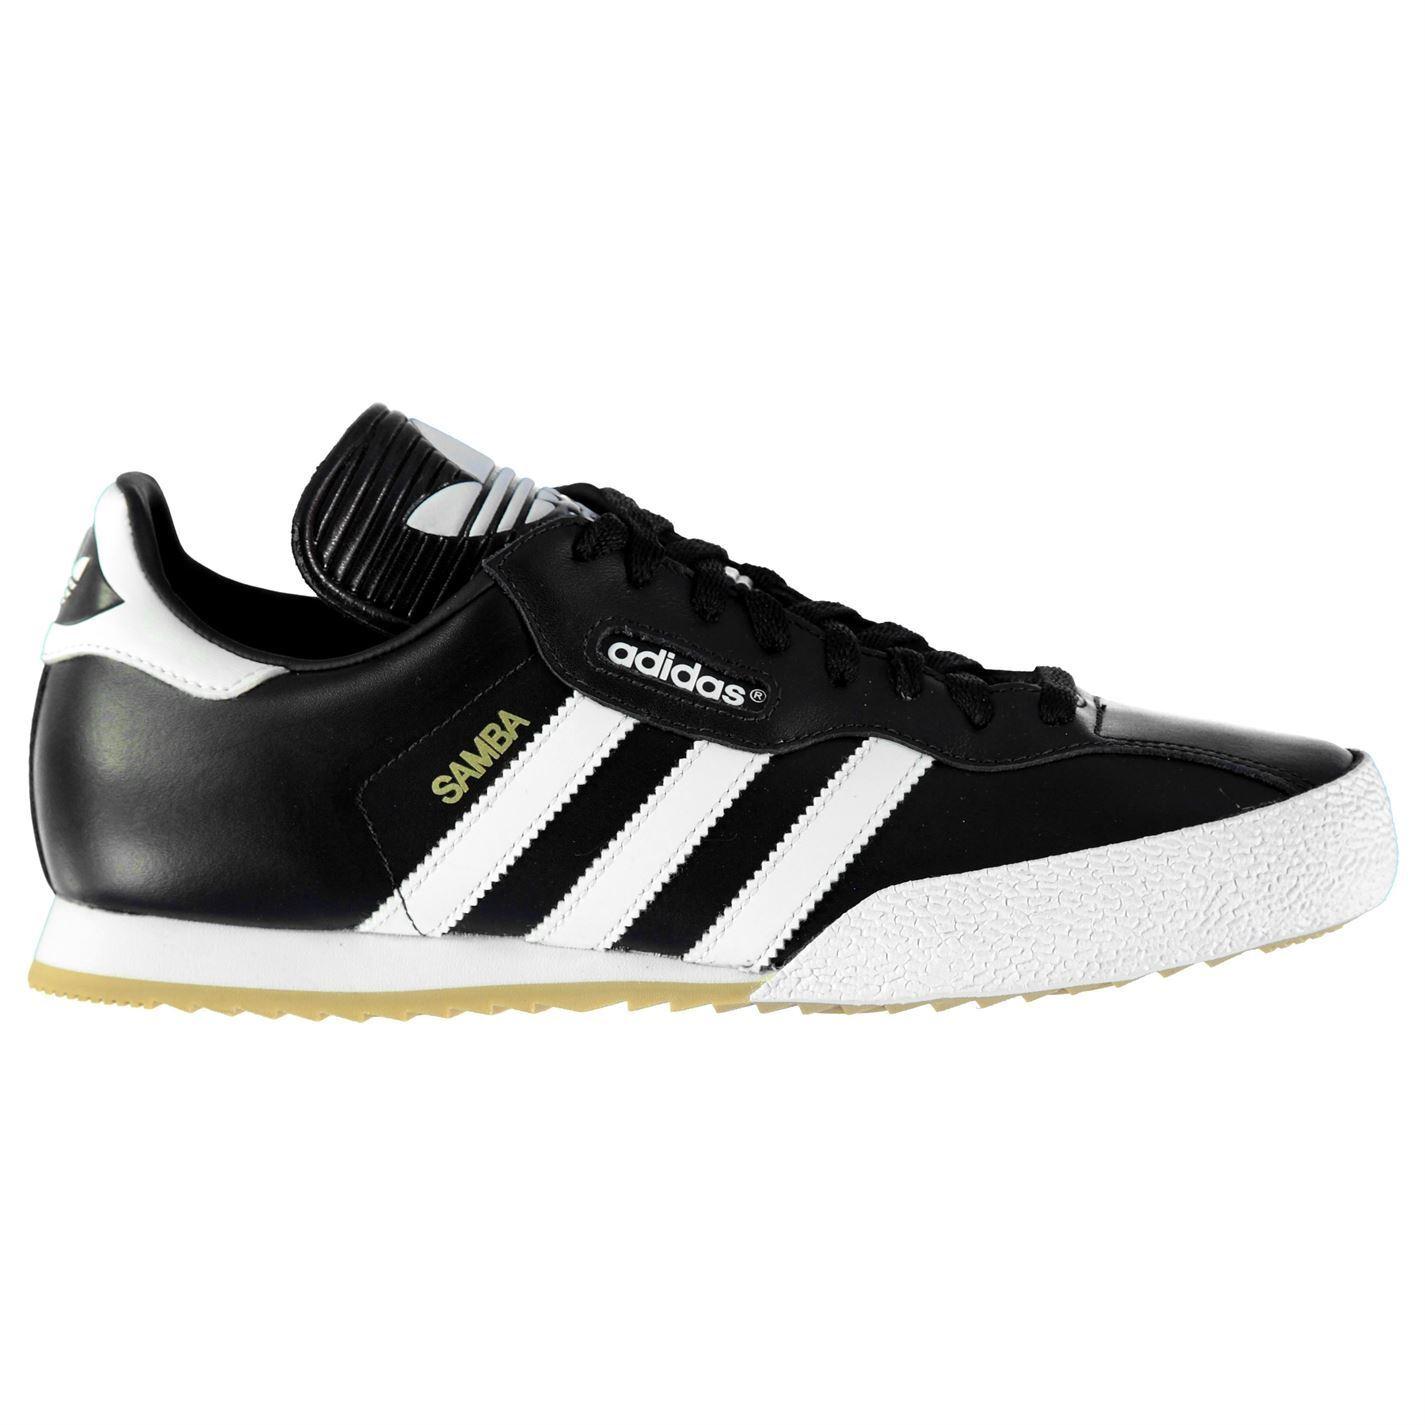 New 2018 Adidas Original Mens Samba Super Shoes Trainers Black/White Sizes 4-14